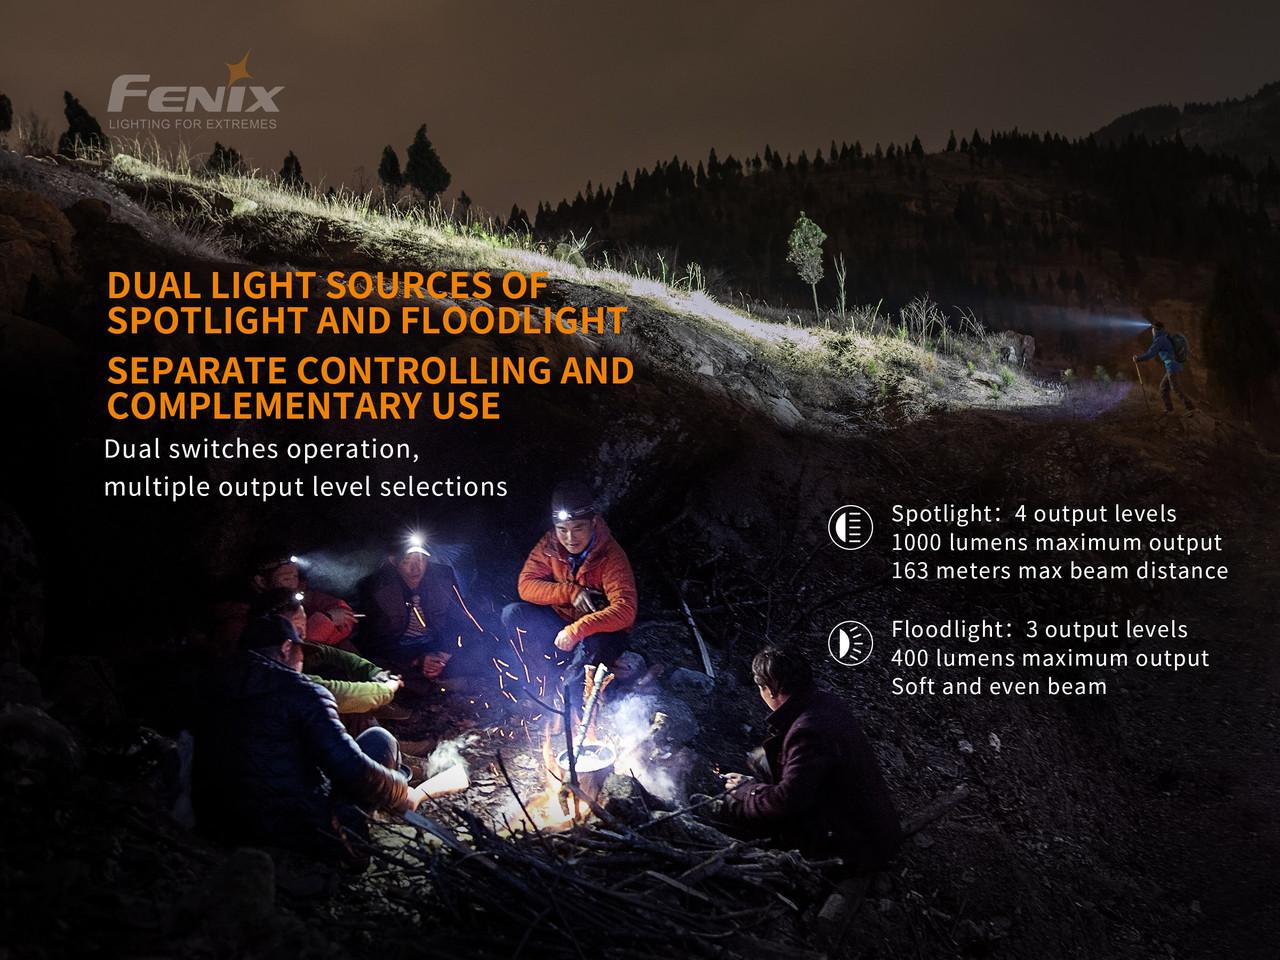 Fenix HM65R 1400 Lumen Headlamp. Dual Light Source